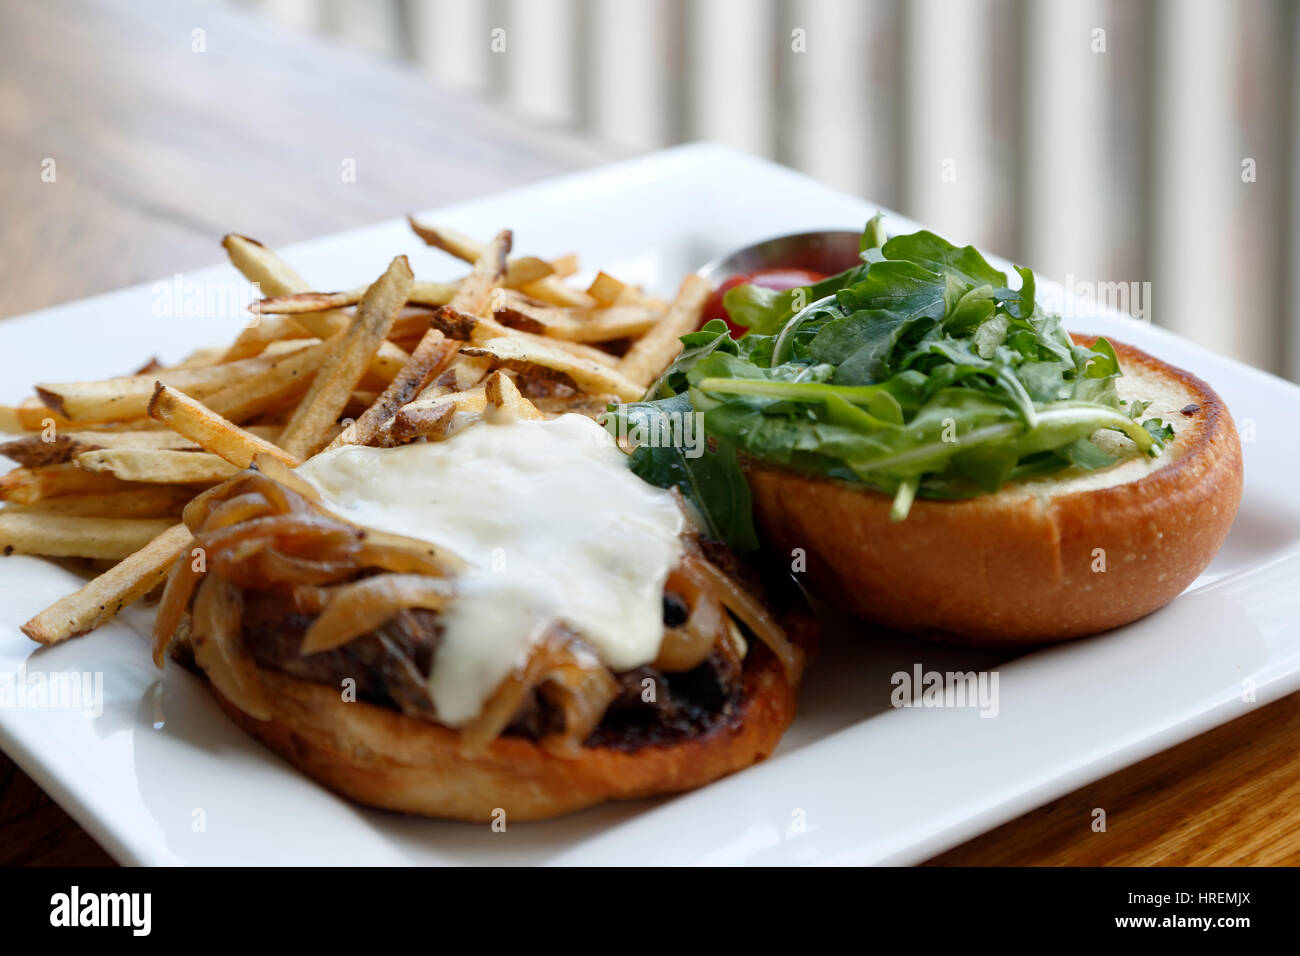 Bison Bistro Burger and fries, Dining Hall, Chautauqua Park, Boulder, Colorado USA - Stock Image